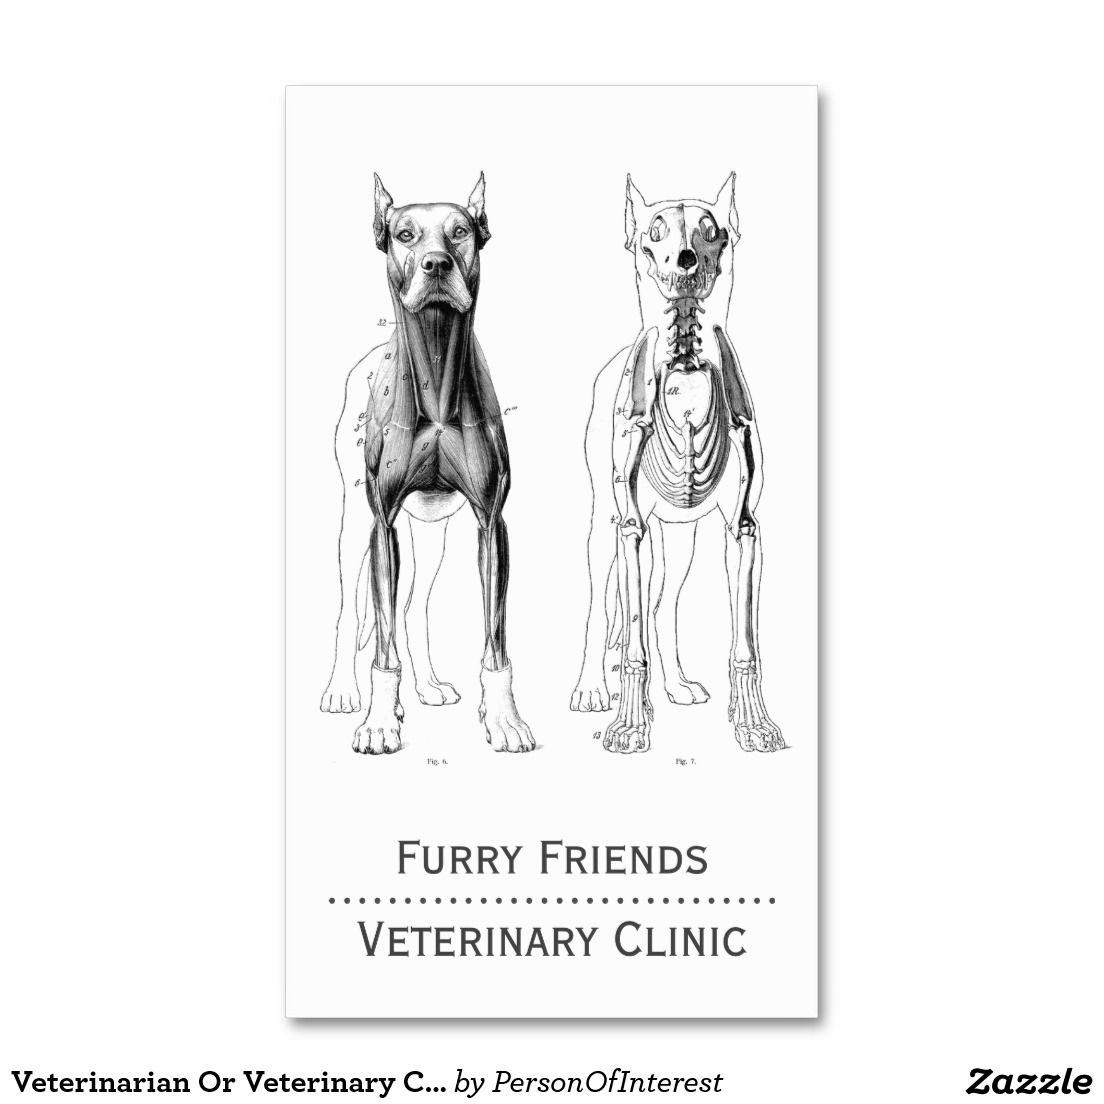 Veterinarian Or Veterinary Clinic Business Cards | Veterinarians ...